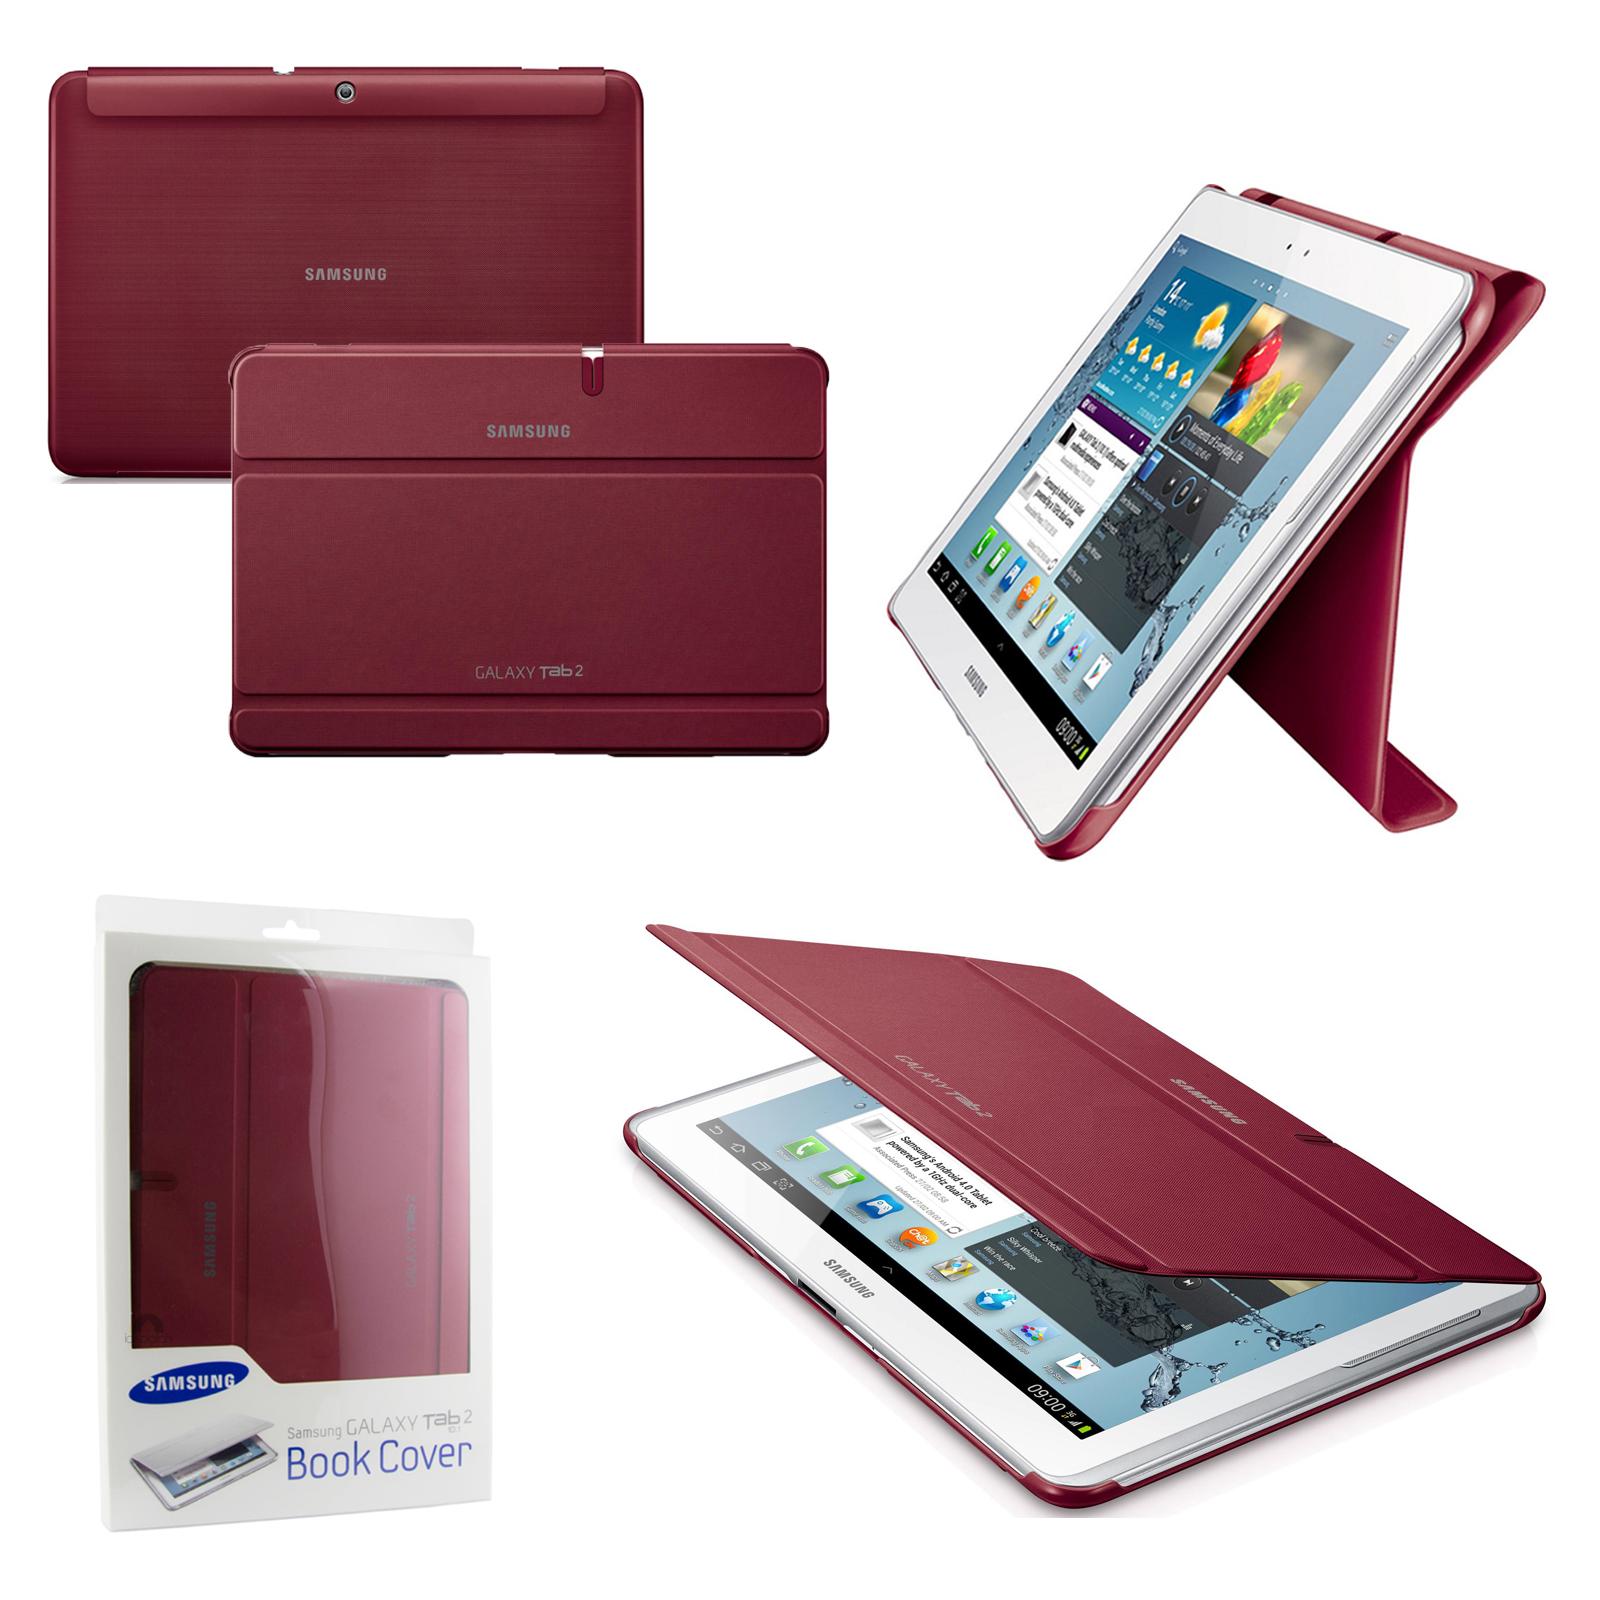 Genuine Samsung Galaxy Tab 2 101 Case For P5110 P5100